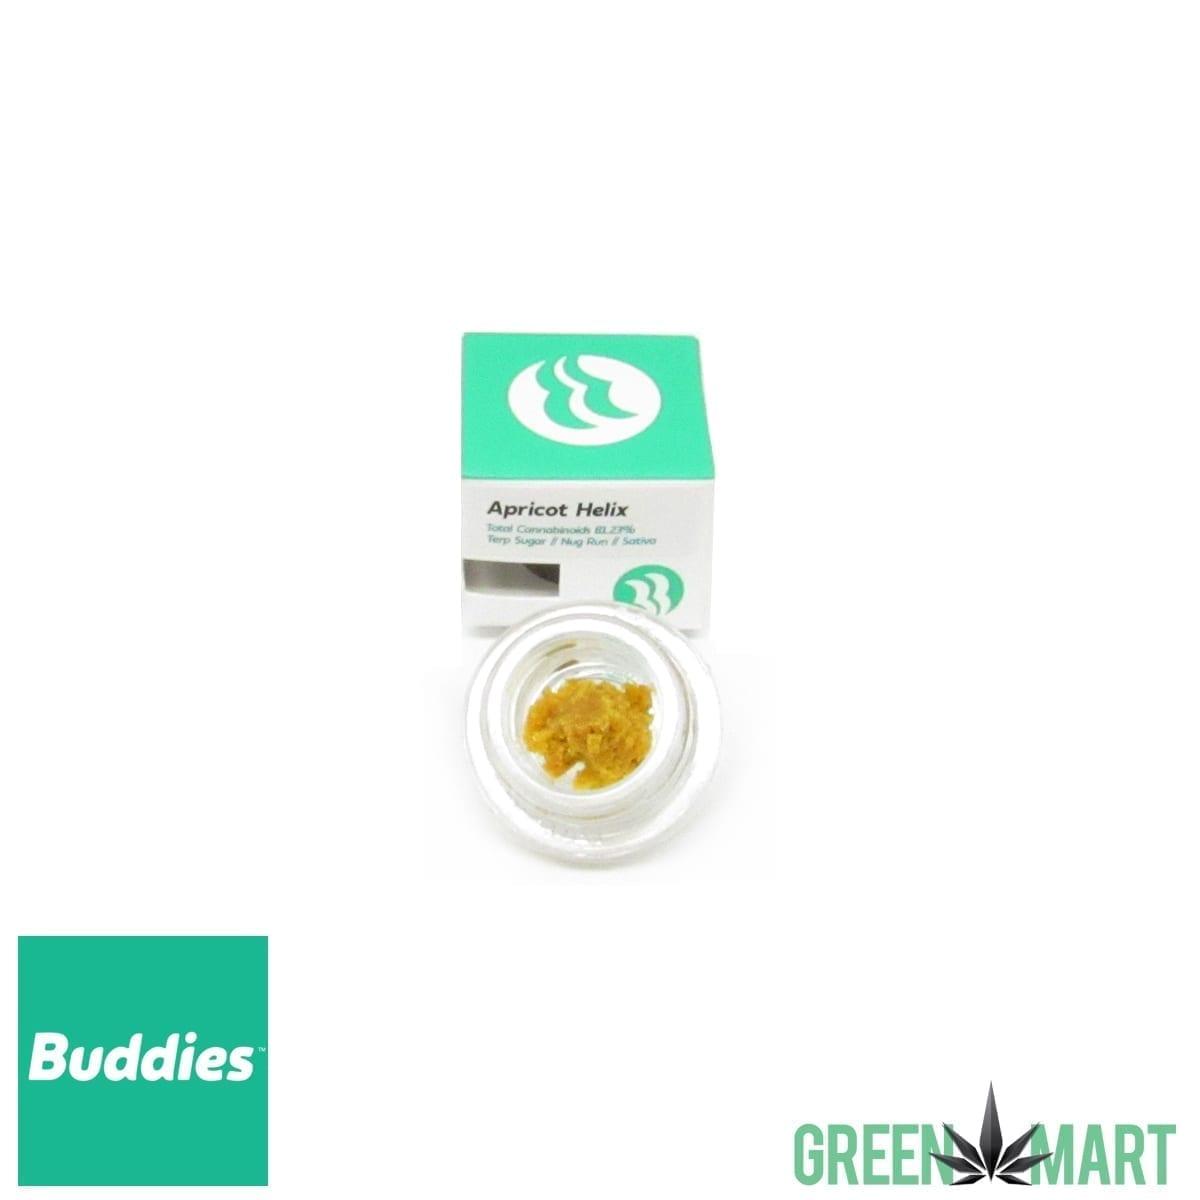 Buddies Brand Terp Sugar - Apricot Helix